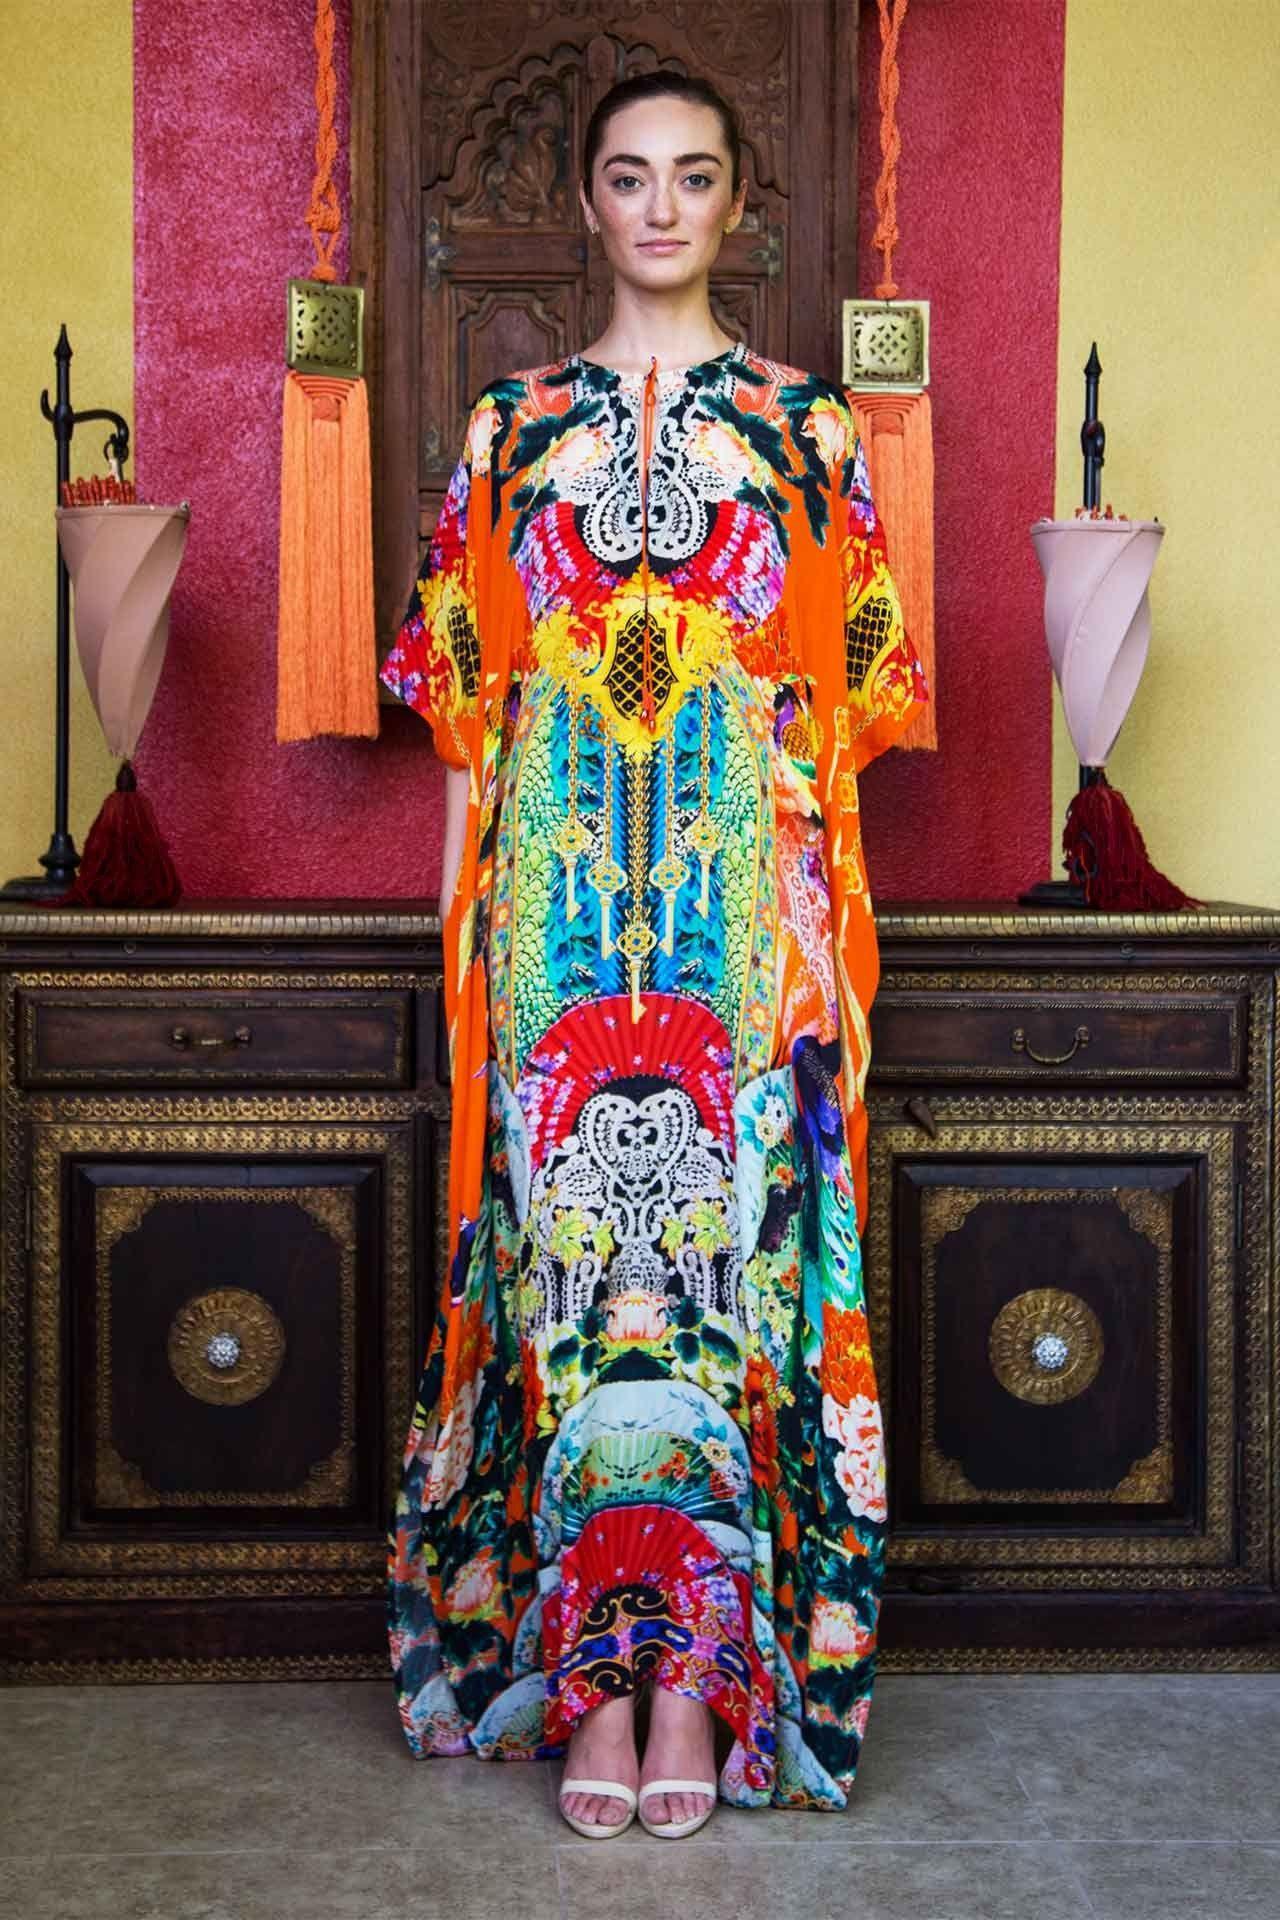 2a7d223f04 Orange Japanese Print Kaftan Dress - Designer Women's Clothing - Shahida  Parides. Find this Pin and more on Designer Kaftans ...